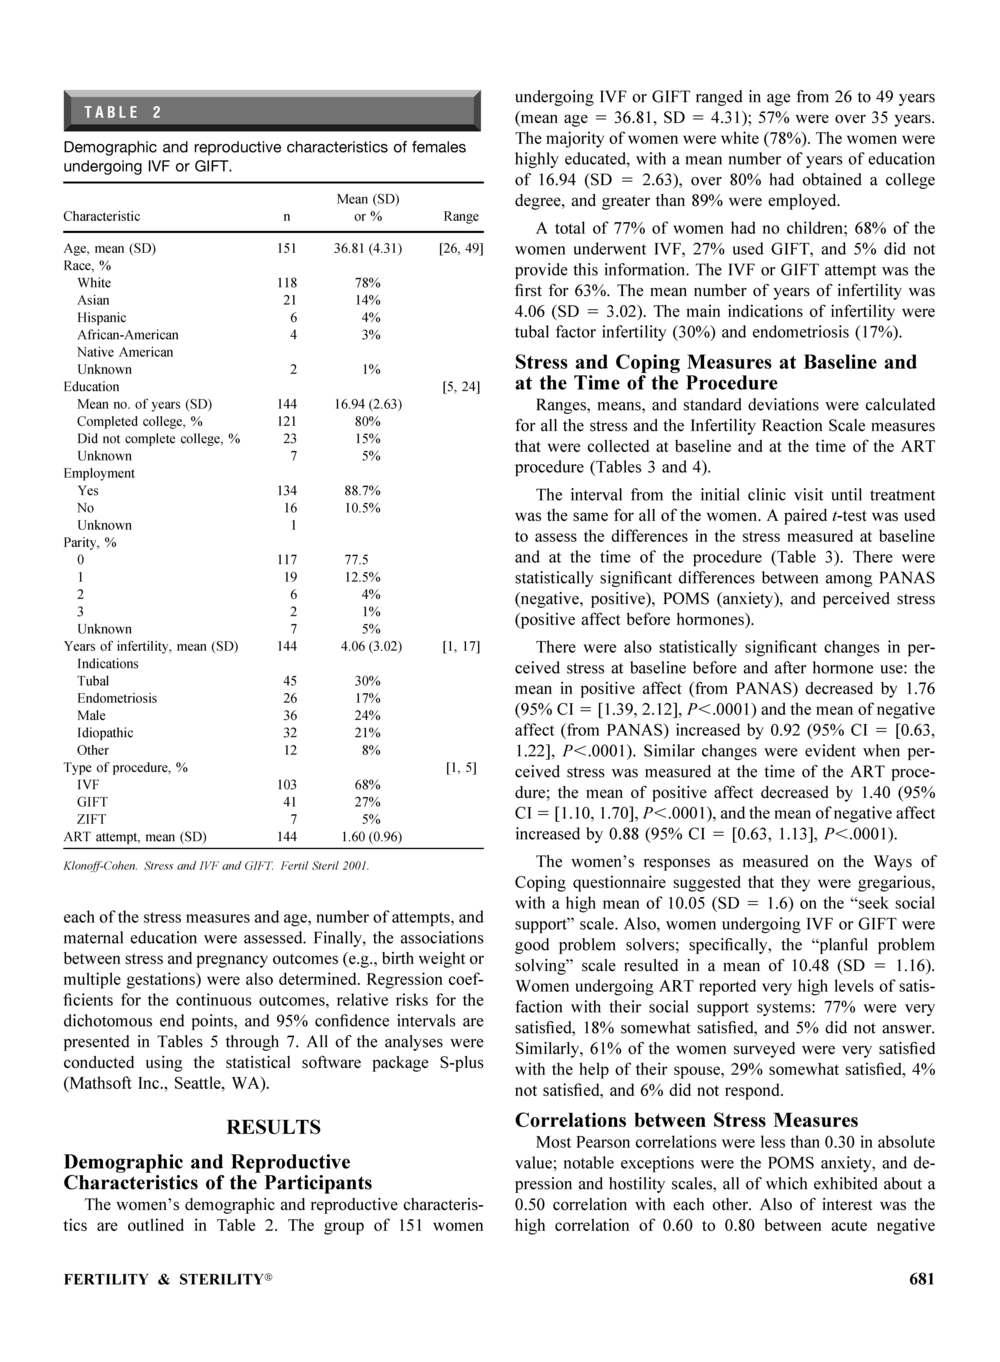 Research_3_pg6.jpg